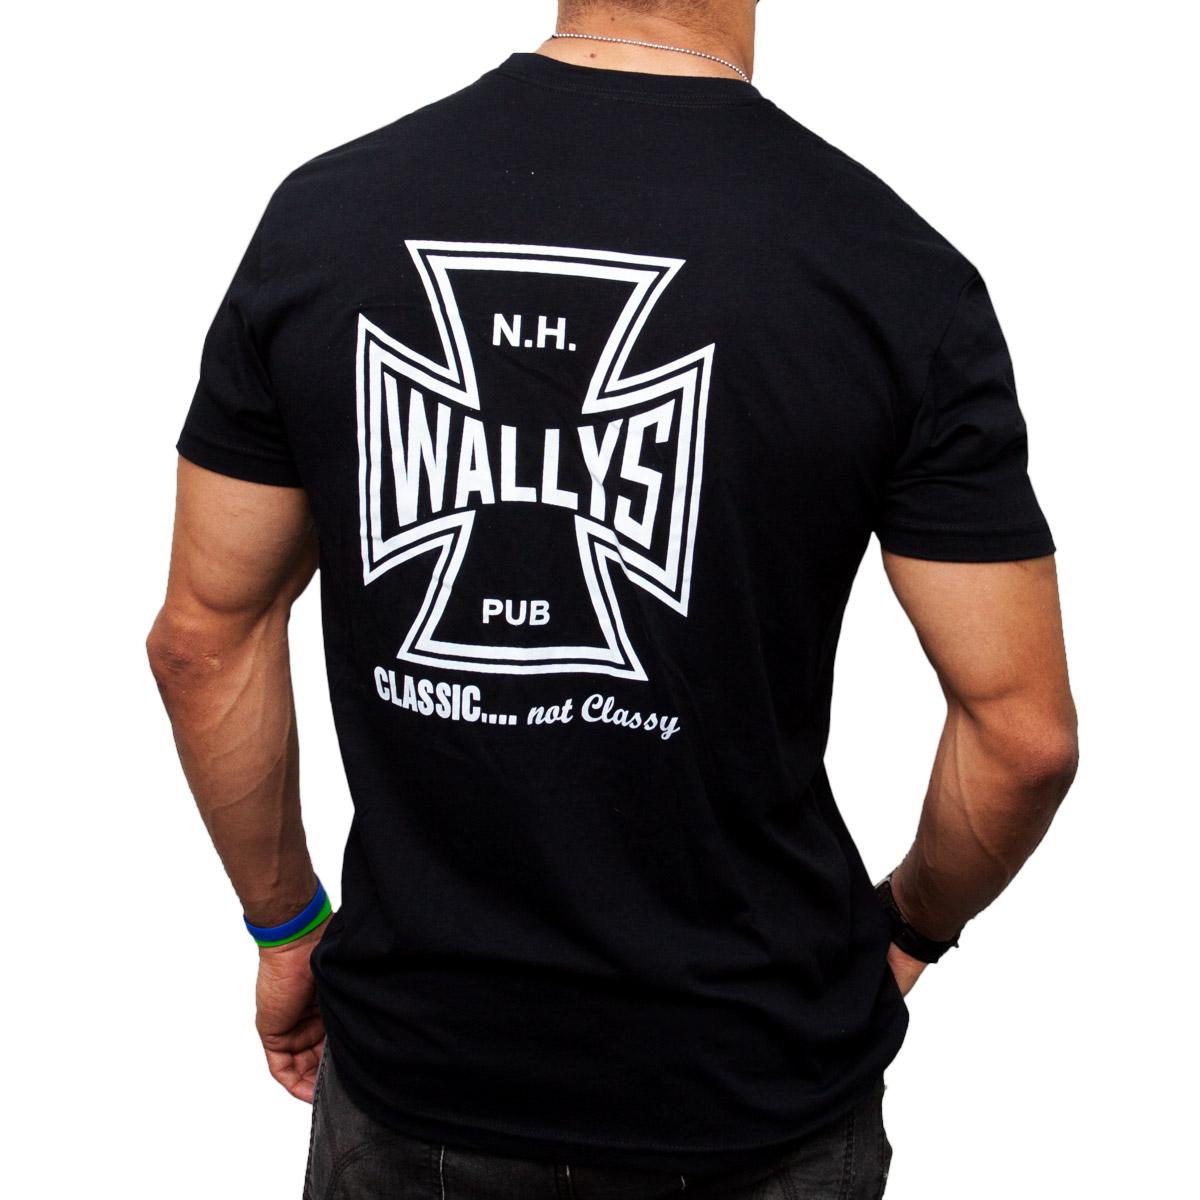 Black t shirt white cross on back - Home Men S Classic Not Classy Cross T Shirt